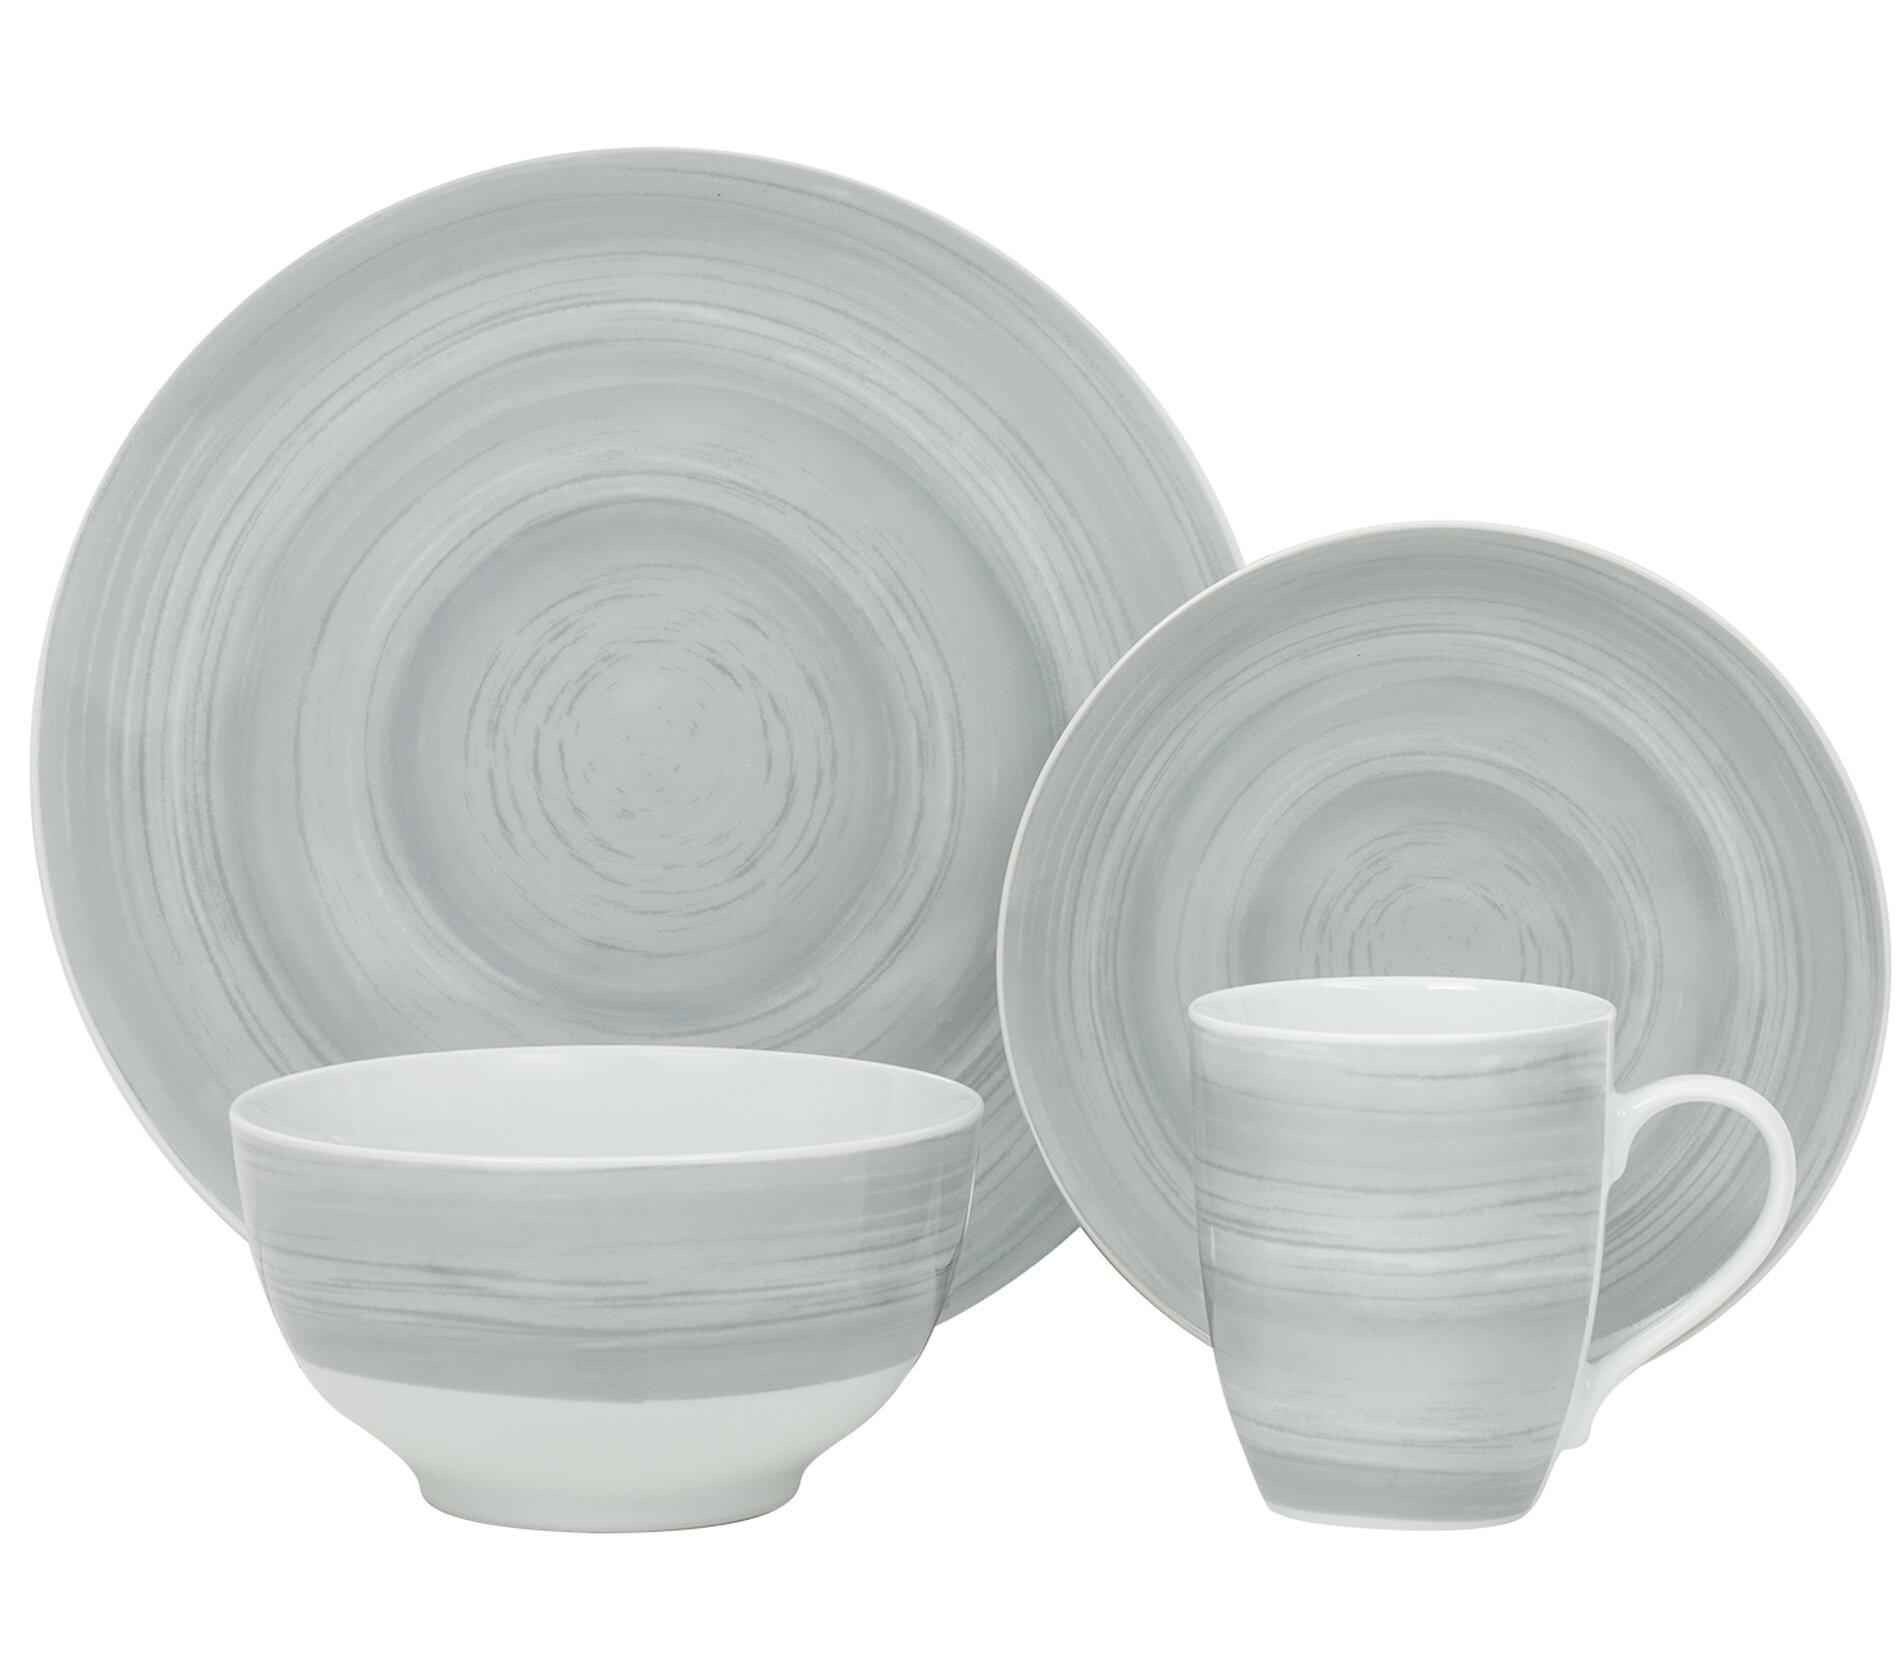 StyleWell 16-Piece Bright Mix /& Match Stoneware Dinnerware Set Service for 4